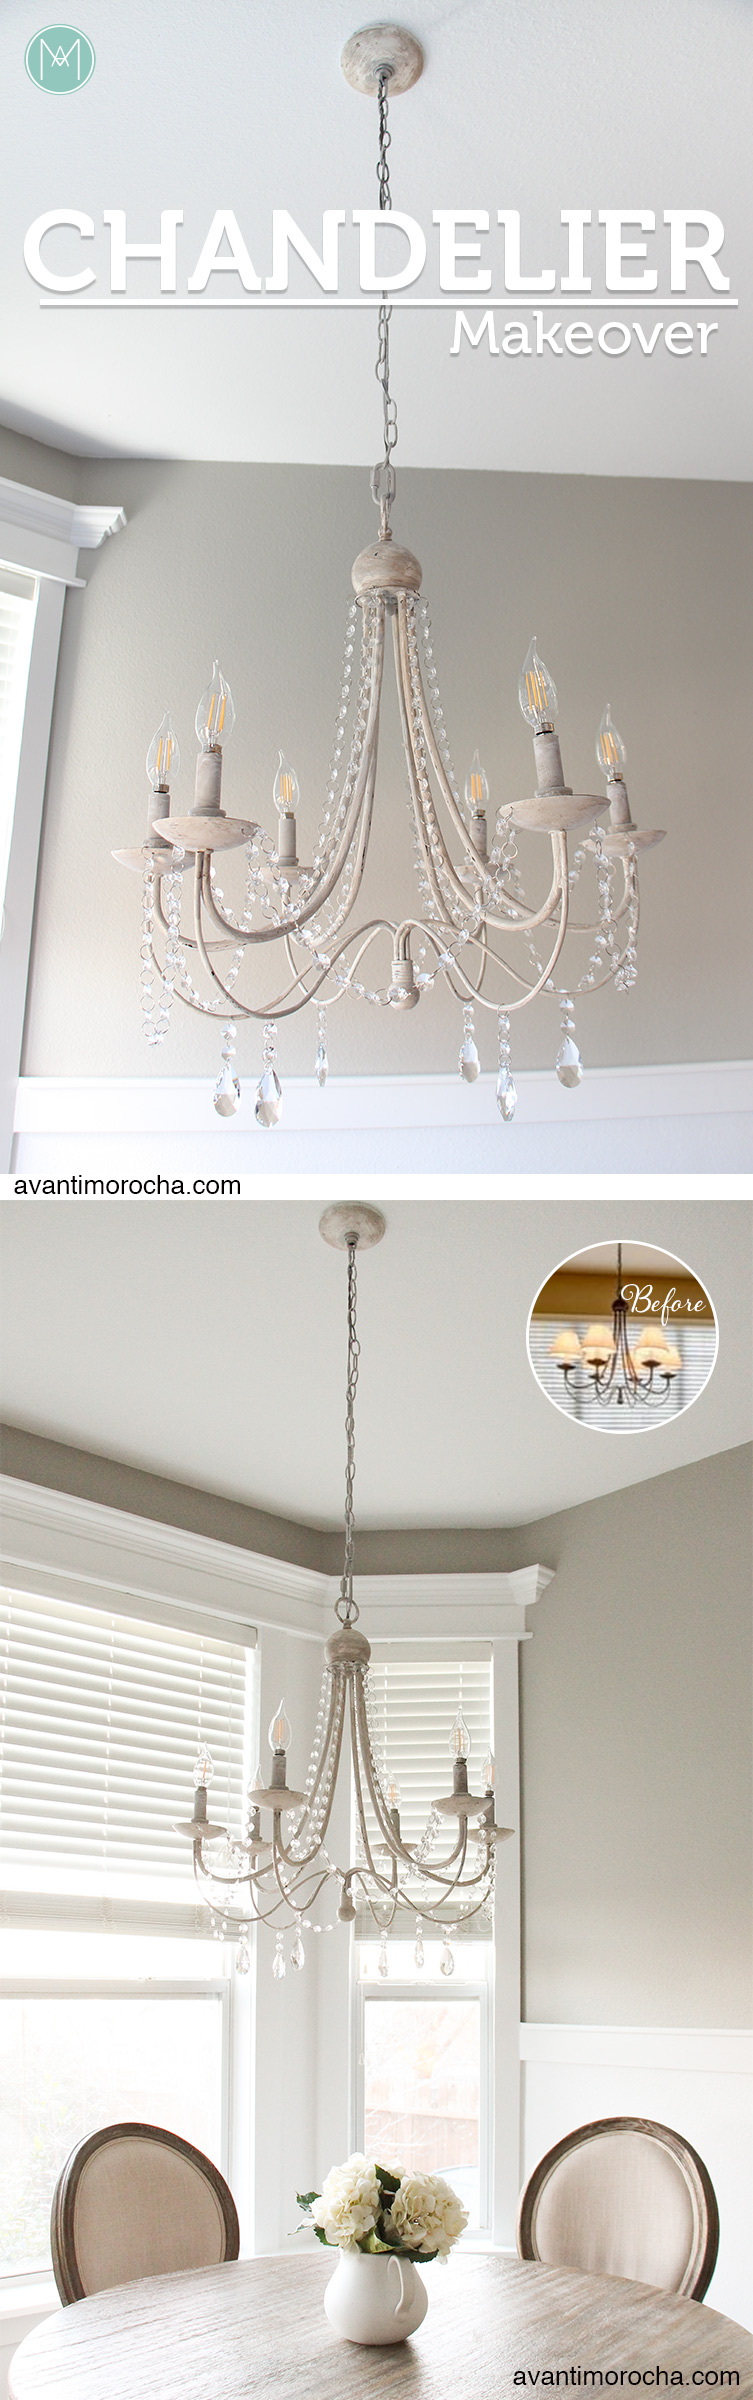 Diy chandelier makeover araa de luces avanti morocha diy chandelier makeover aloadofball Choice Image